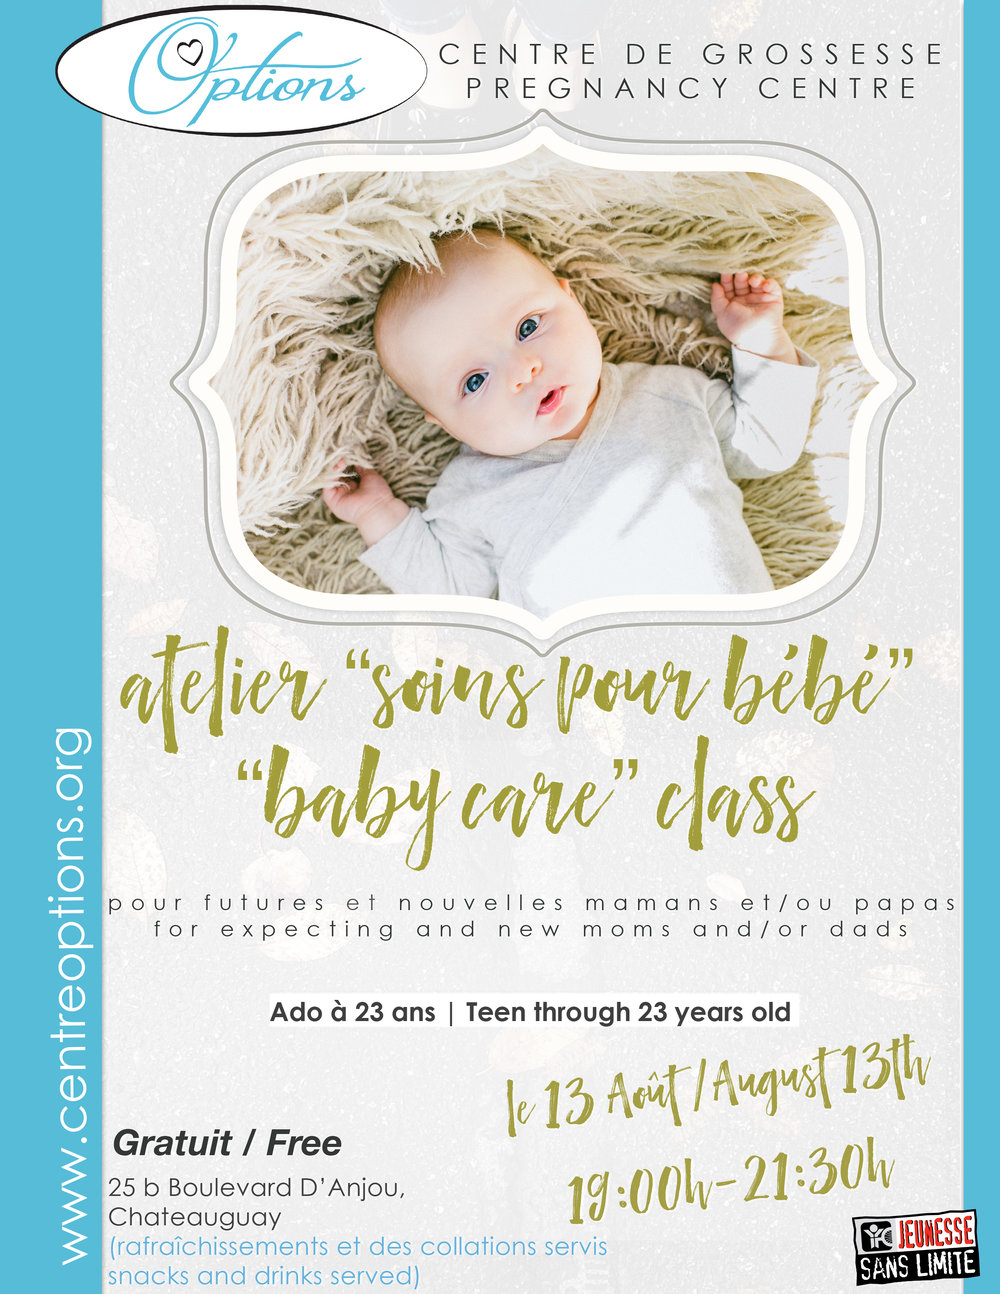 baby care 101.jpg